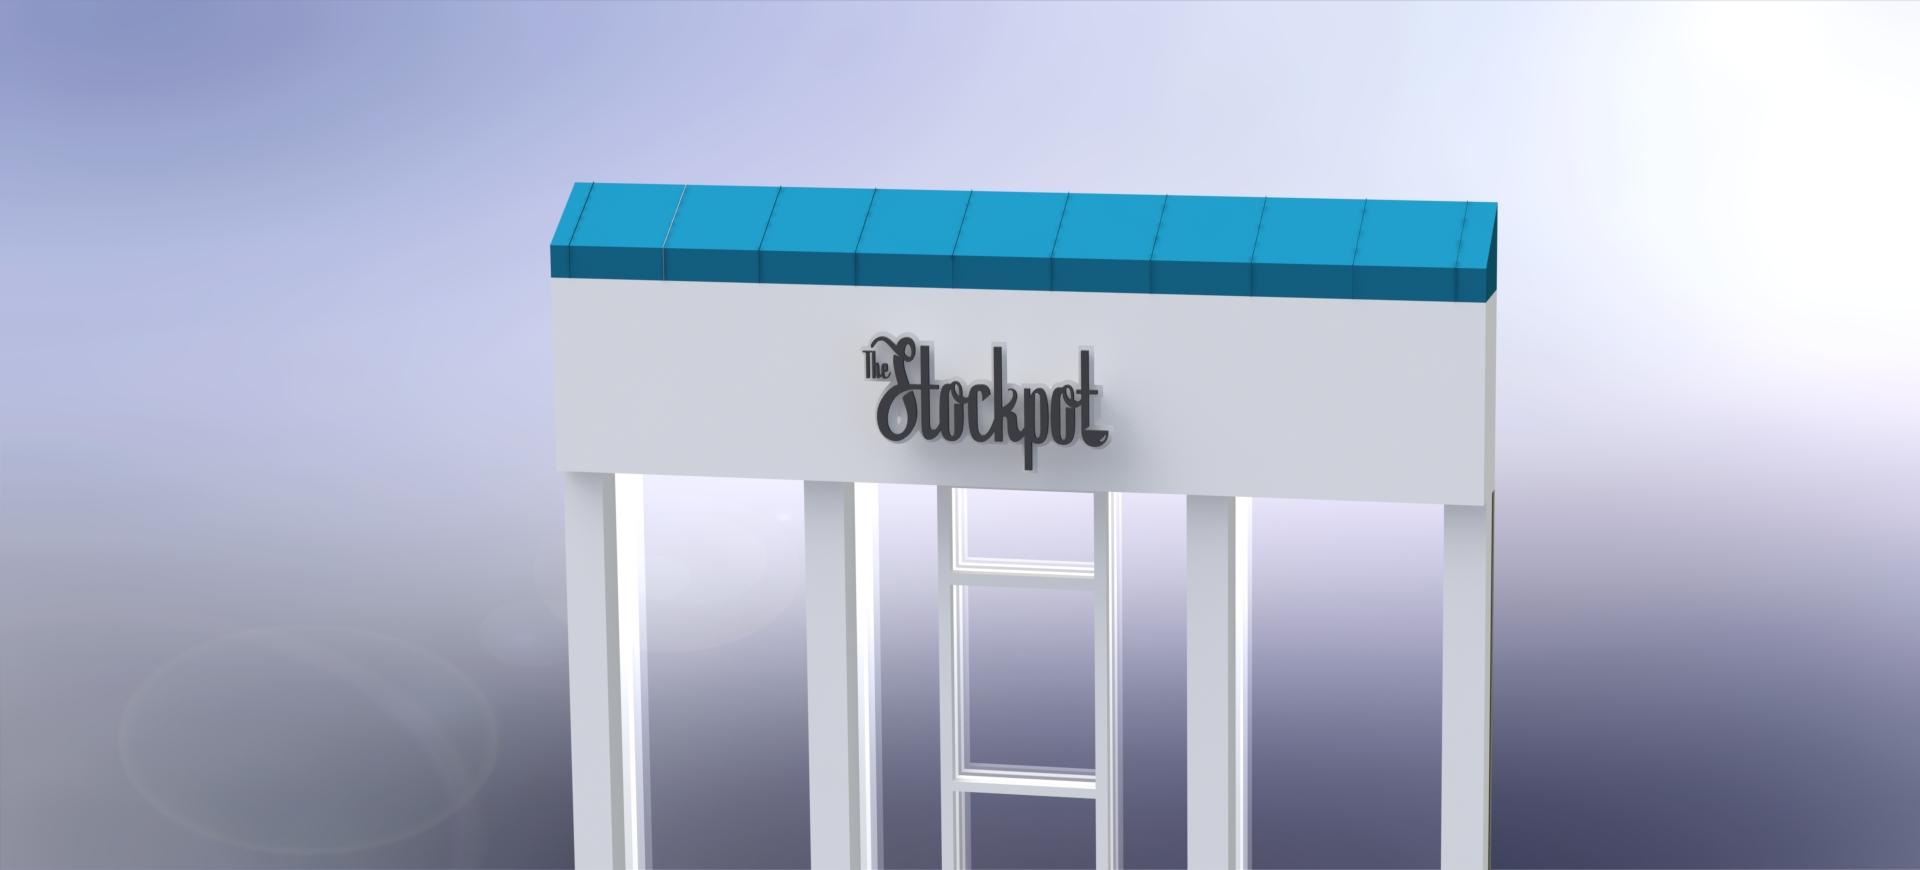 stockpot.JPG